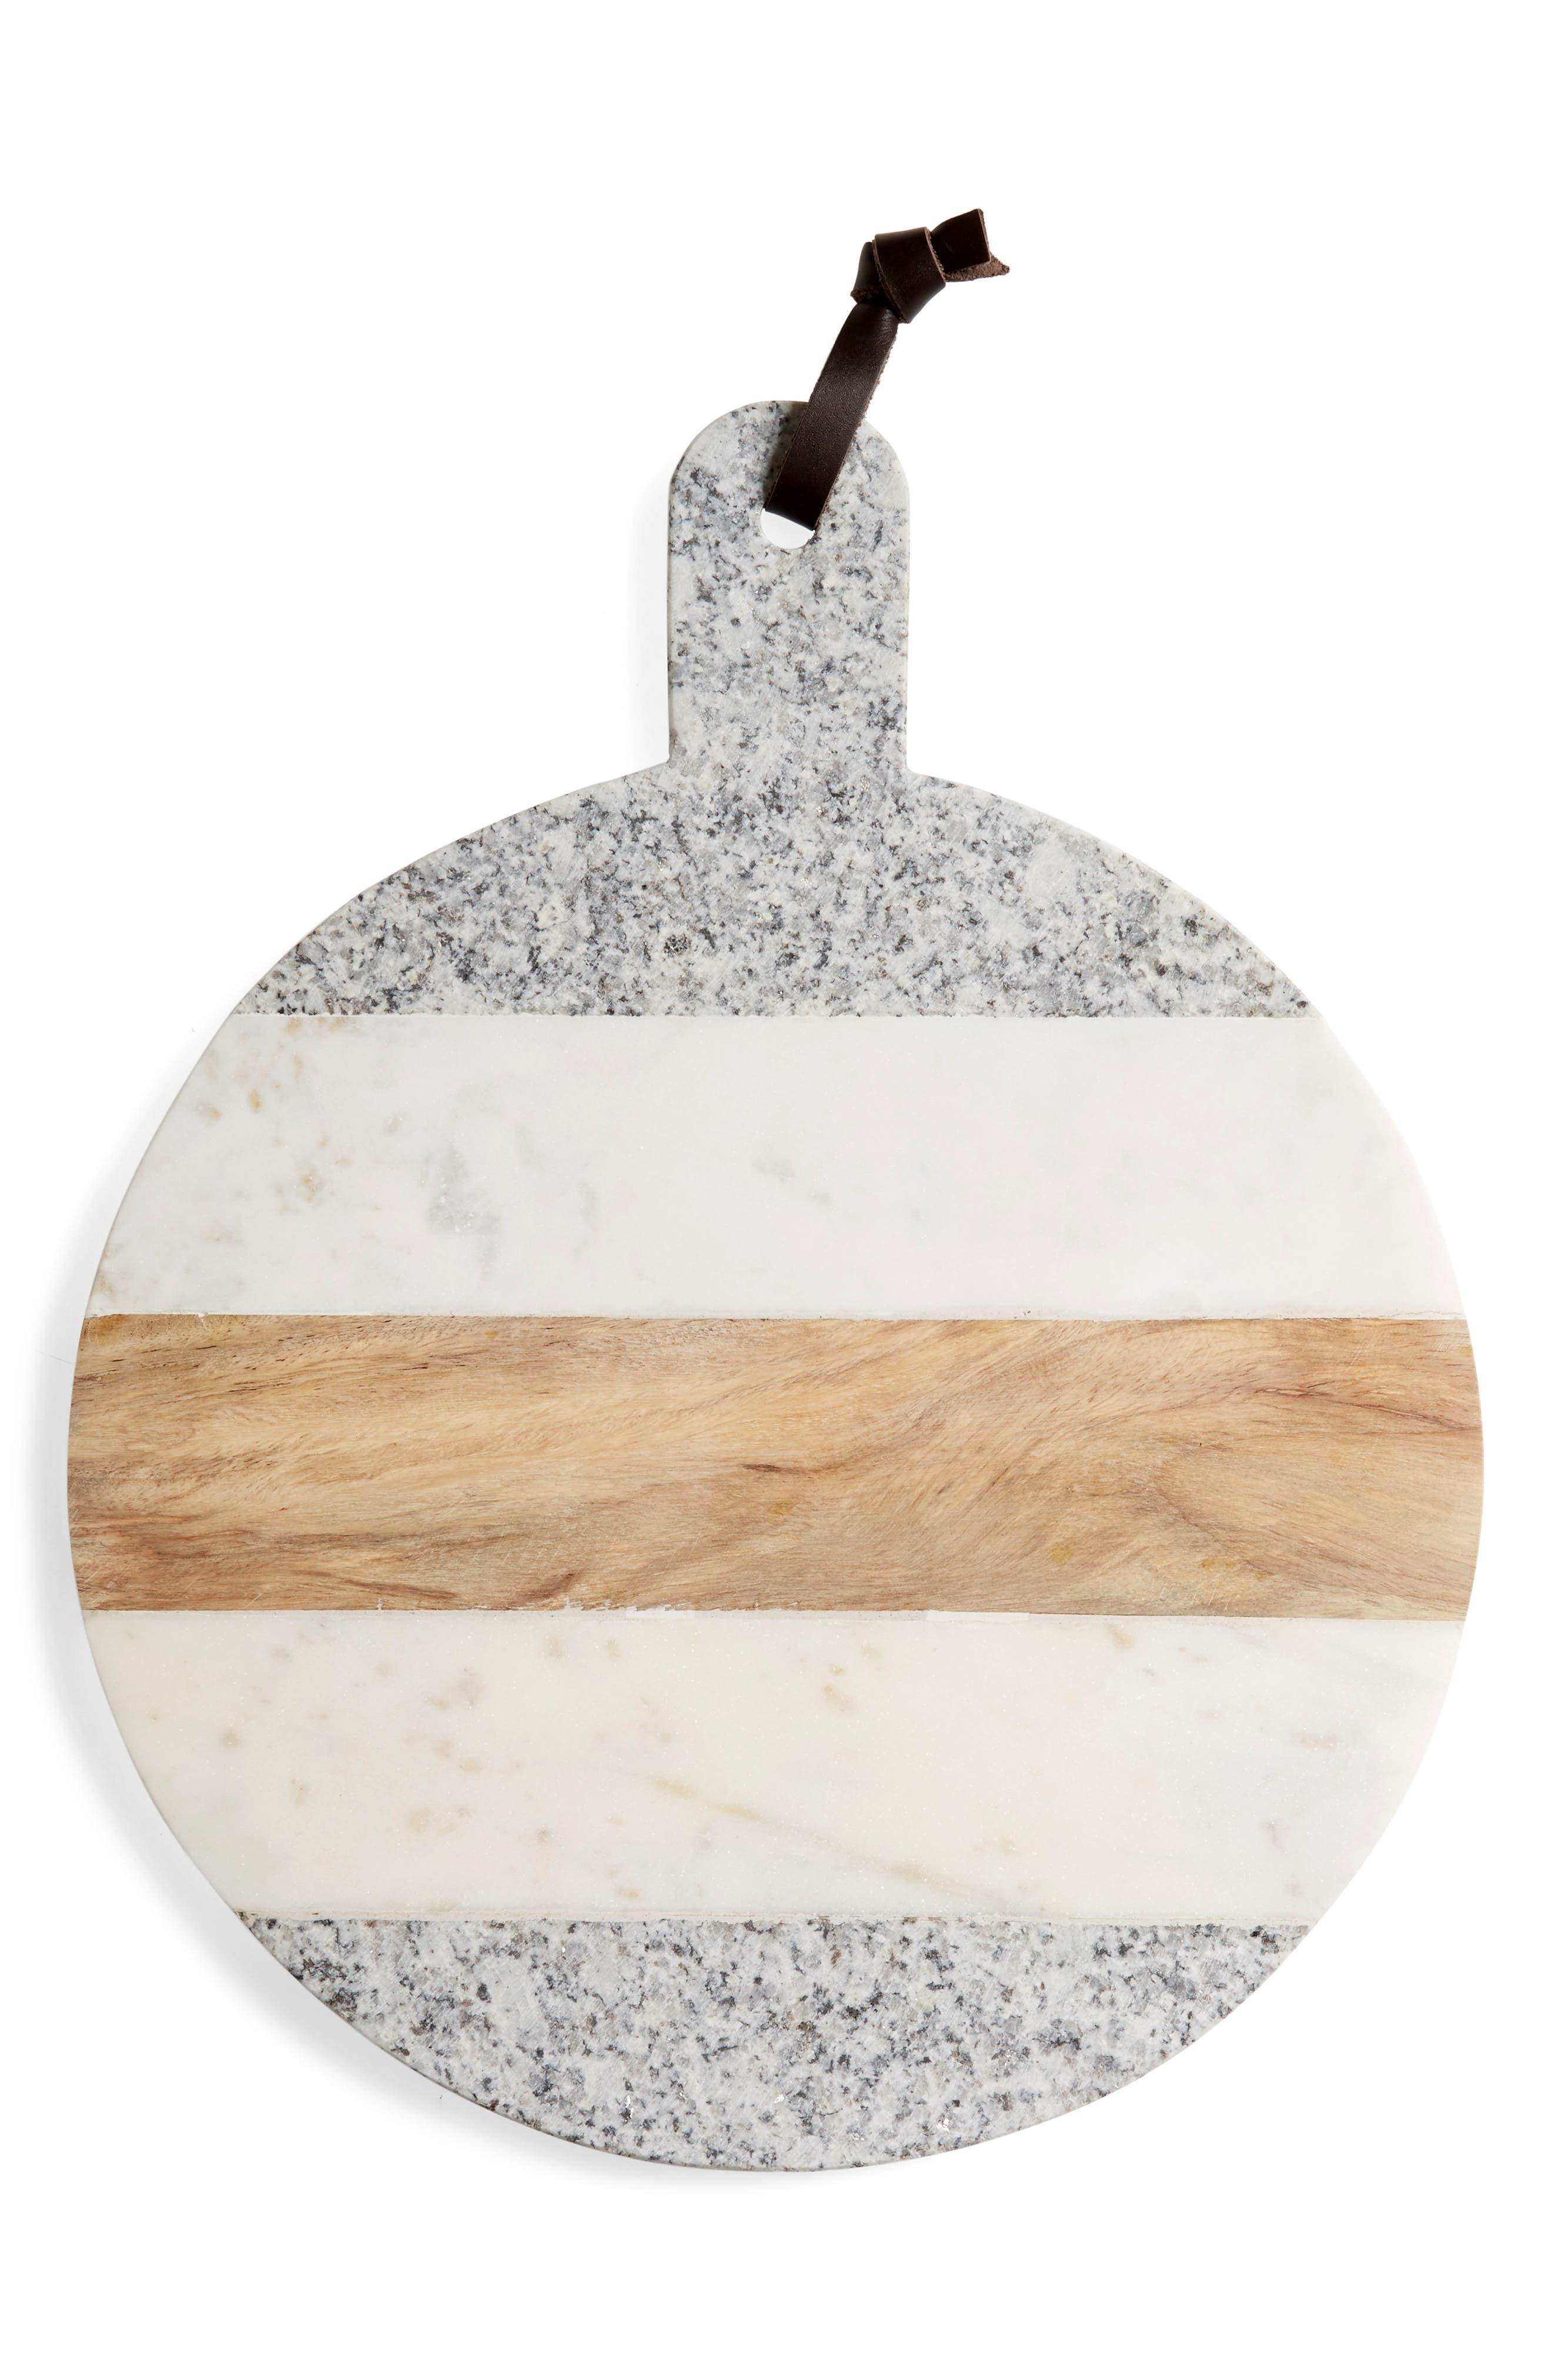 Marble, Wood & Granite Round Board,                         Main,                         color, 020